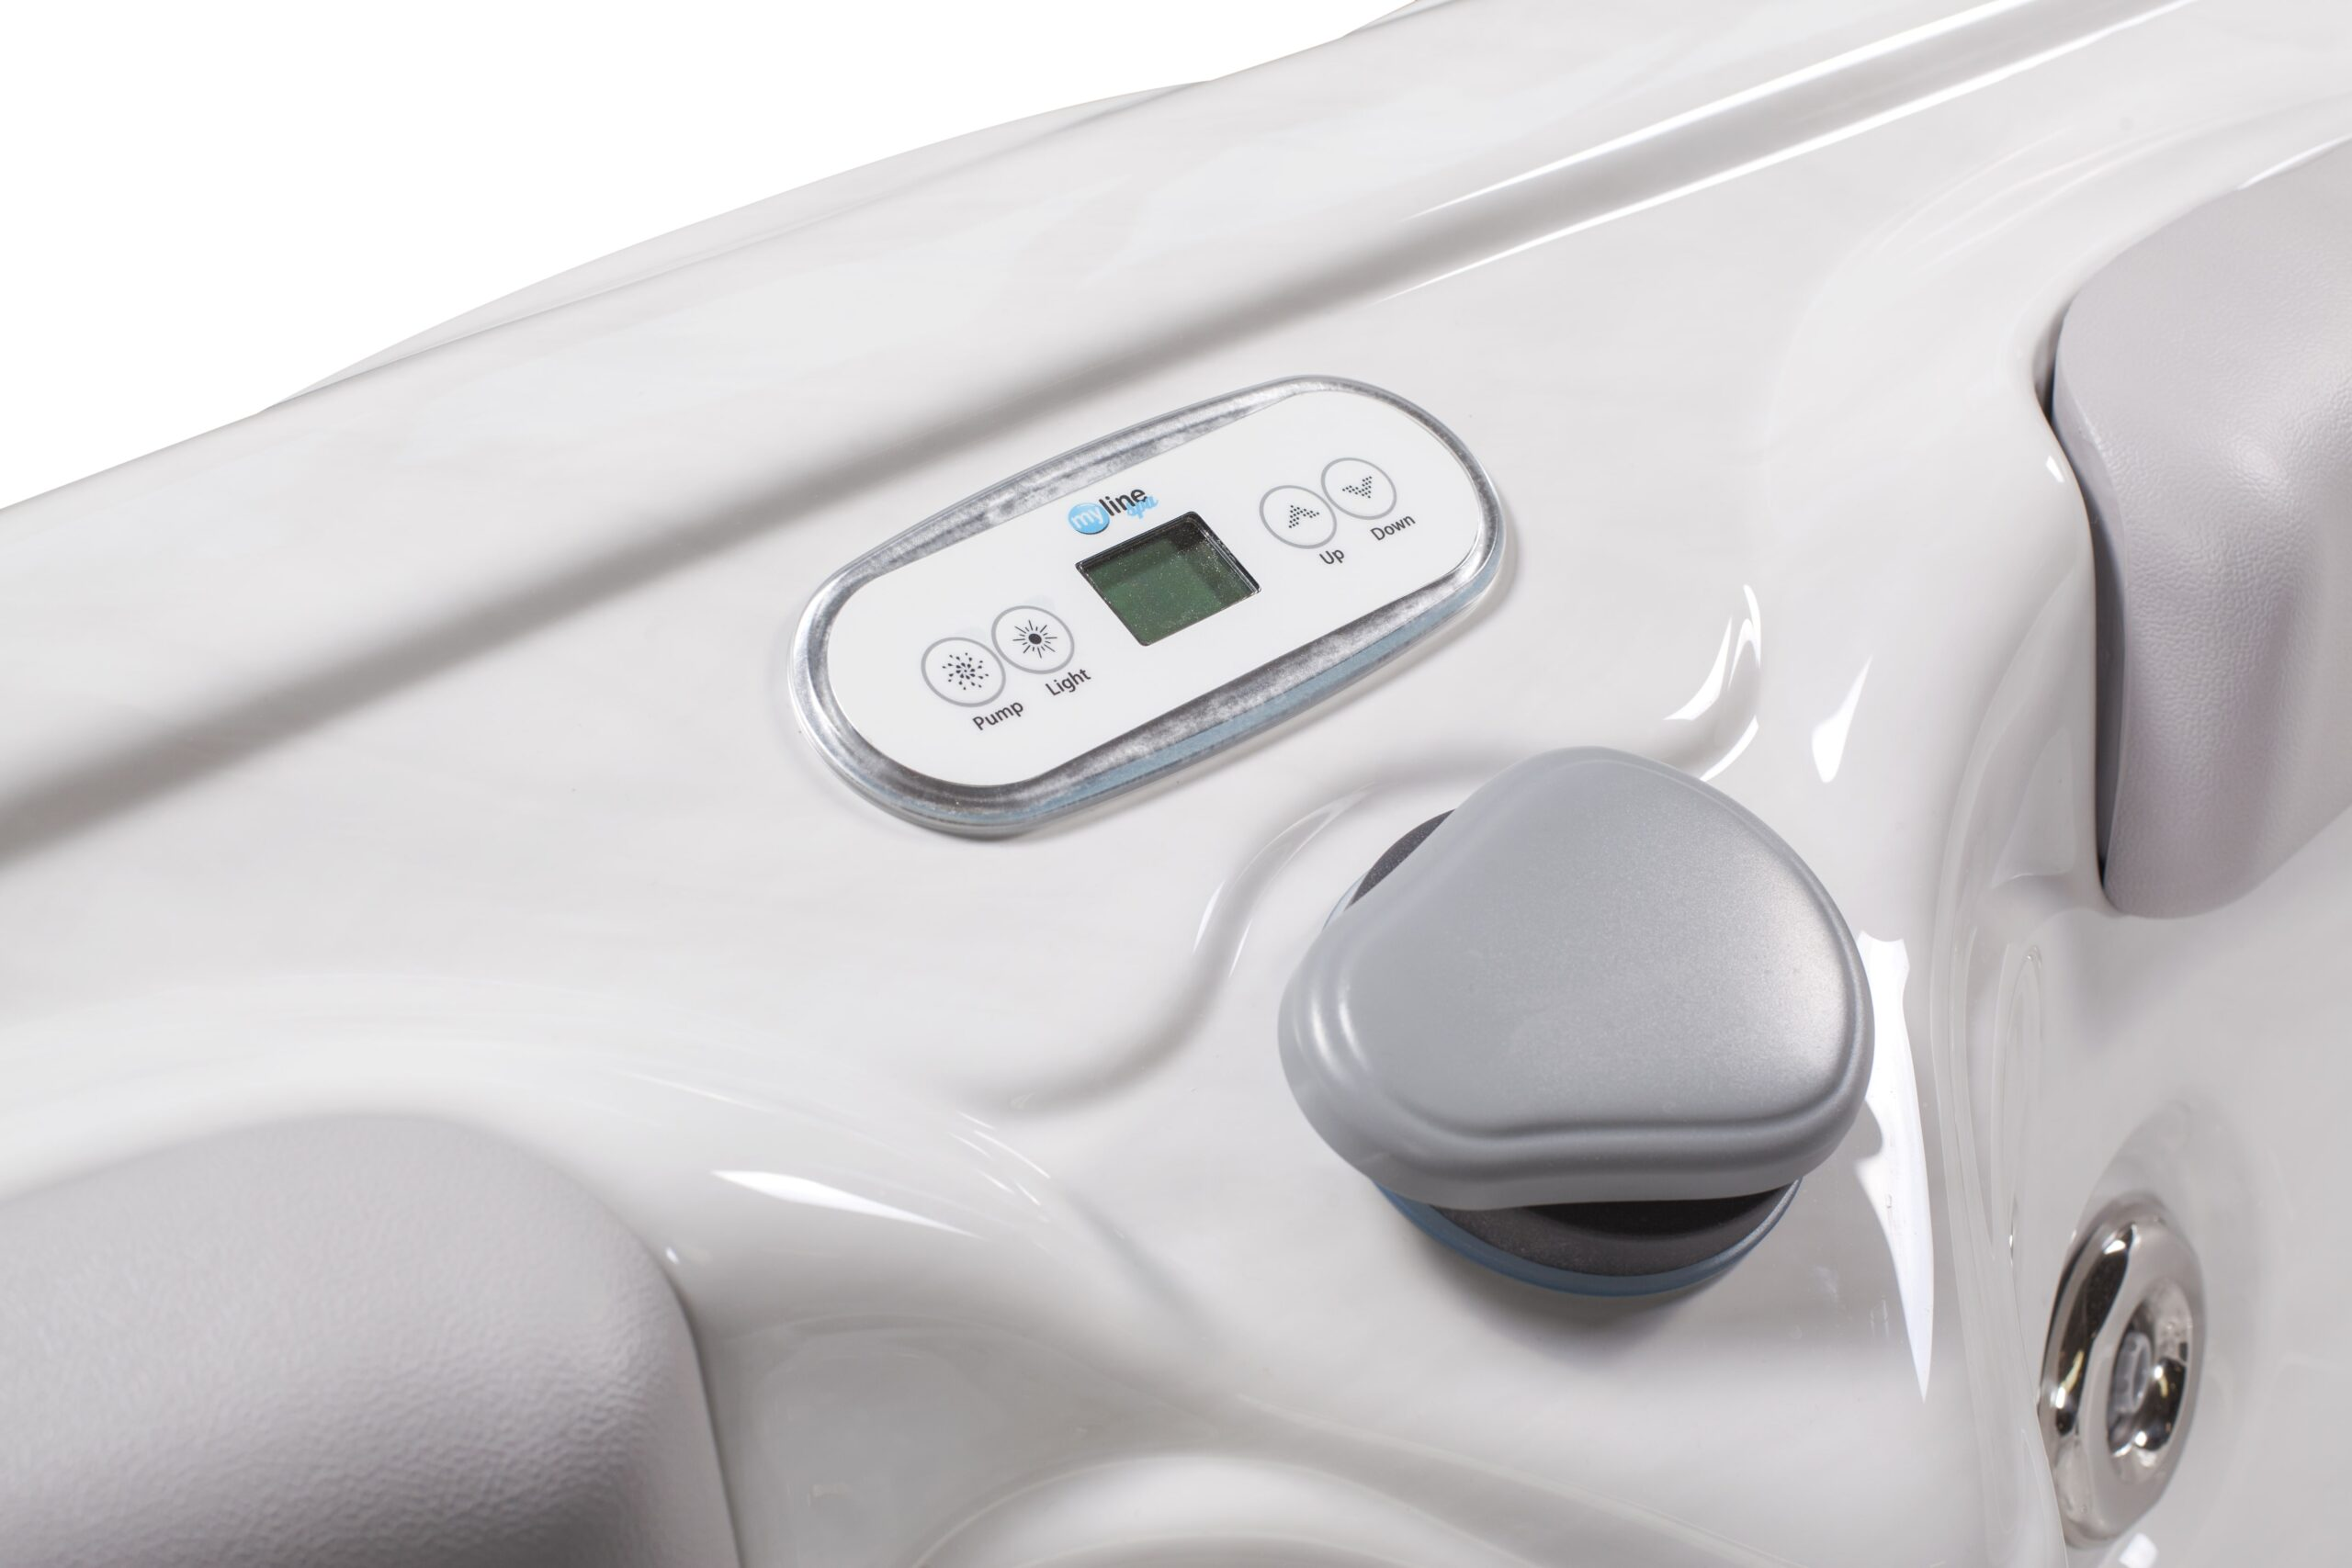 Myline Mars hot tub